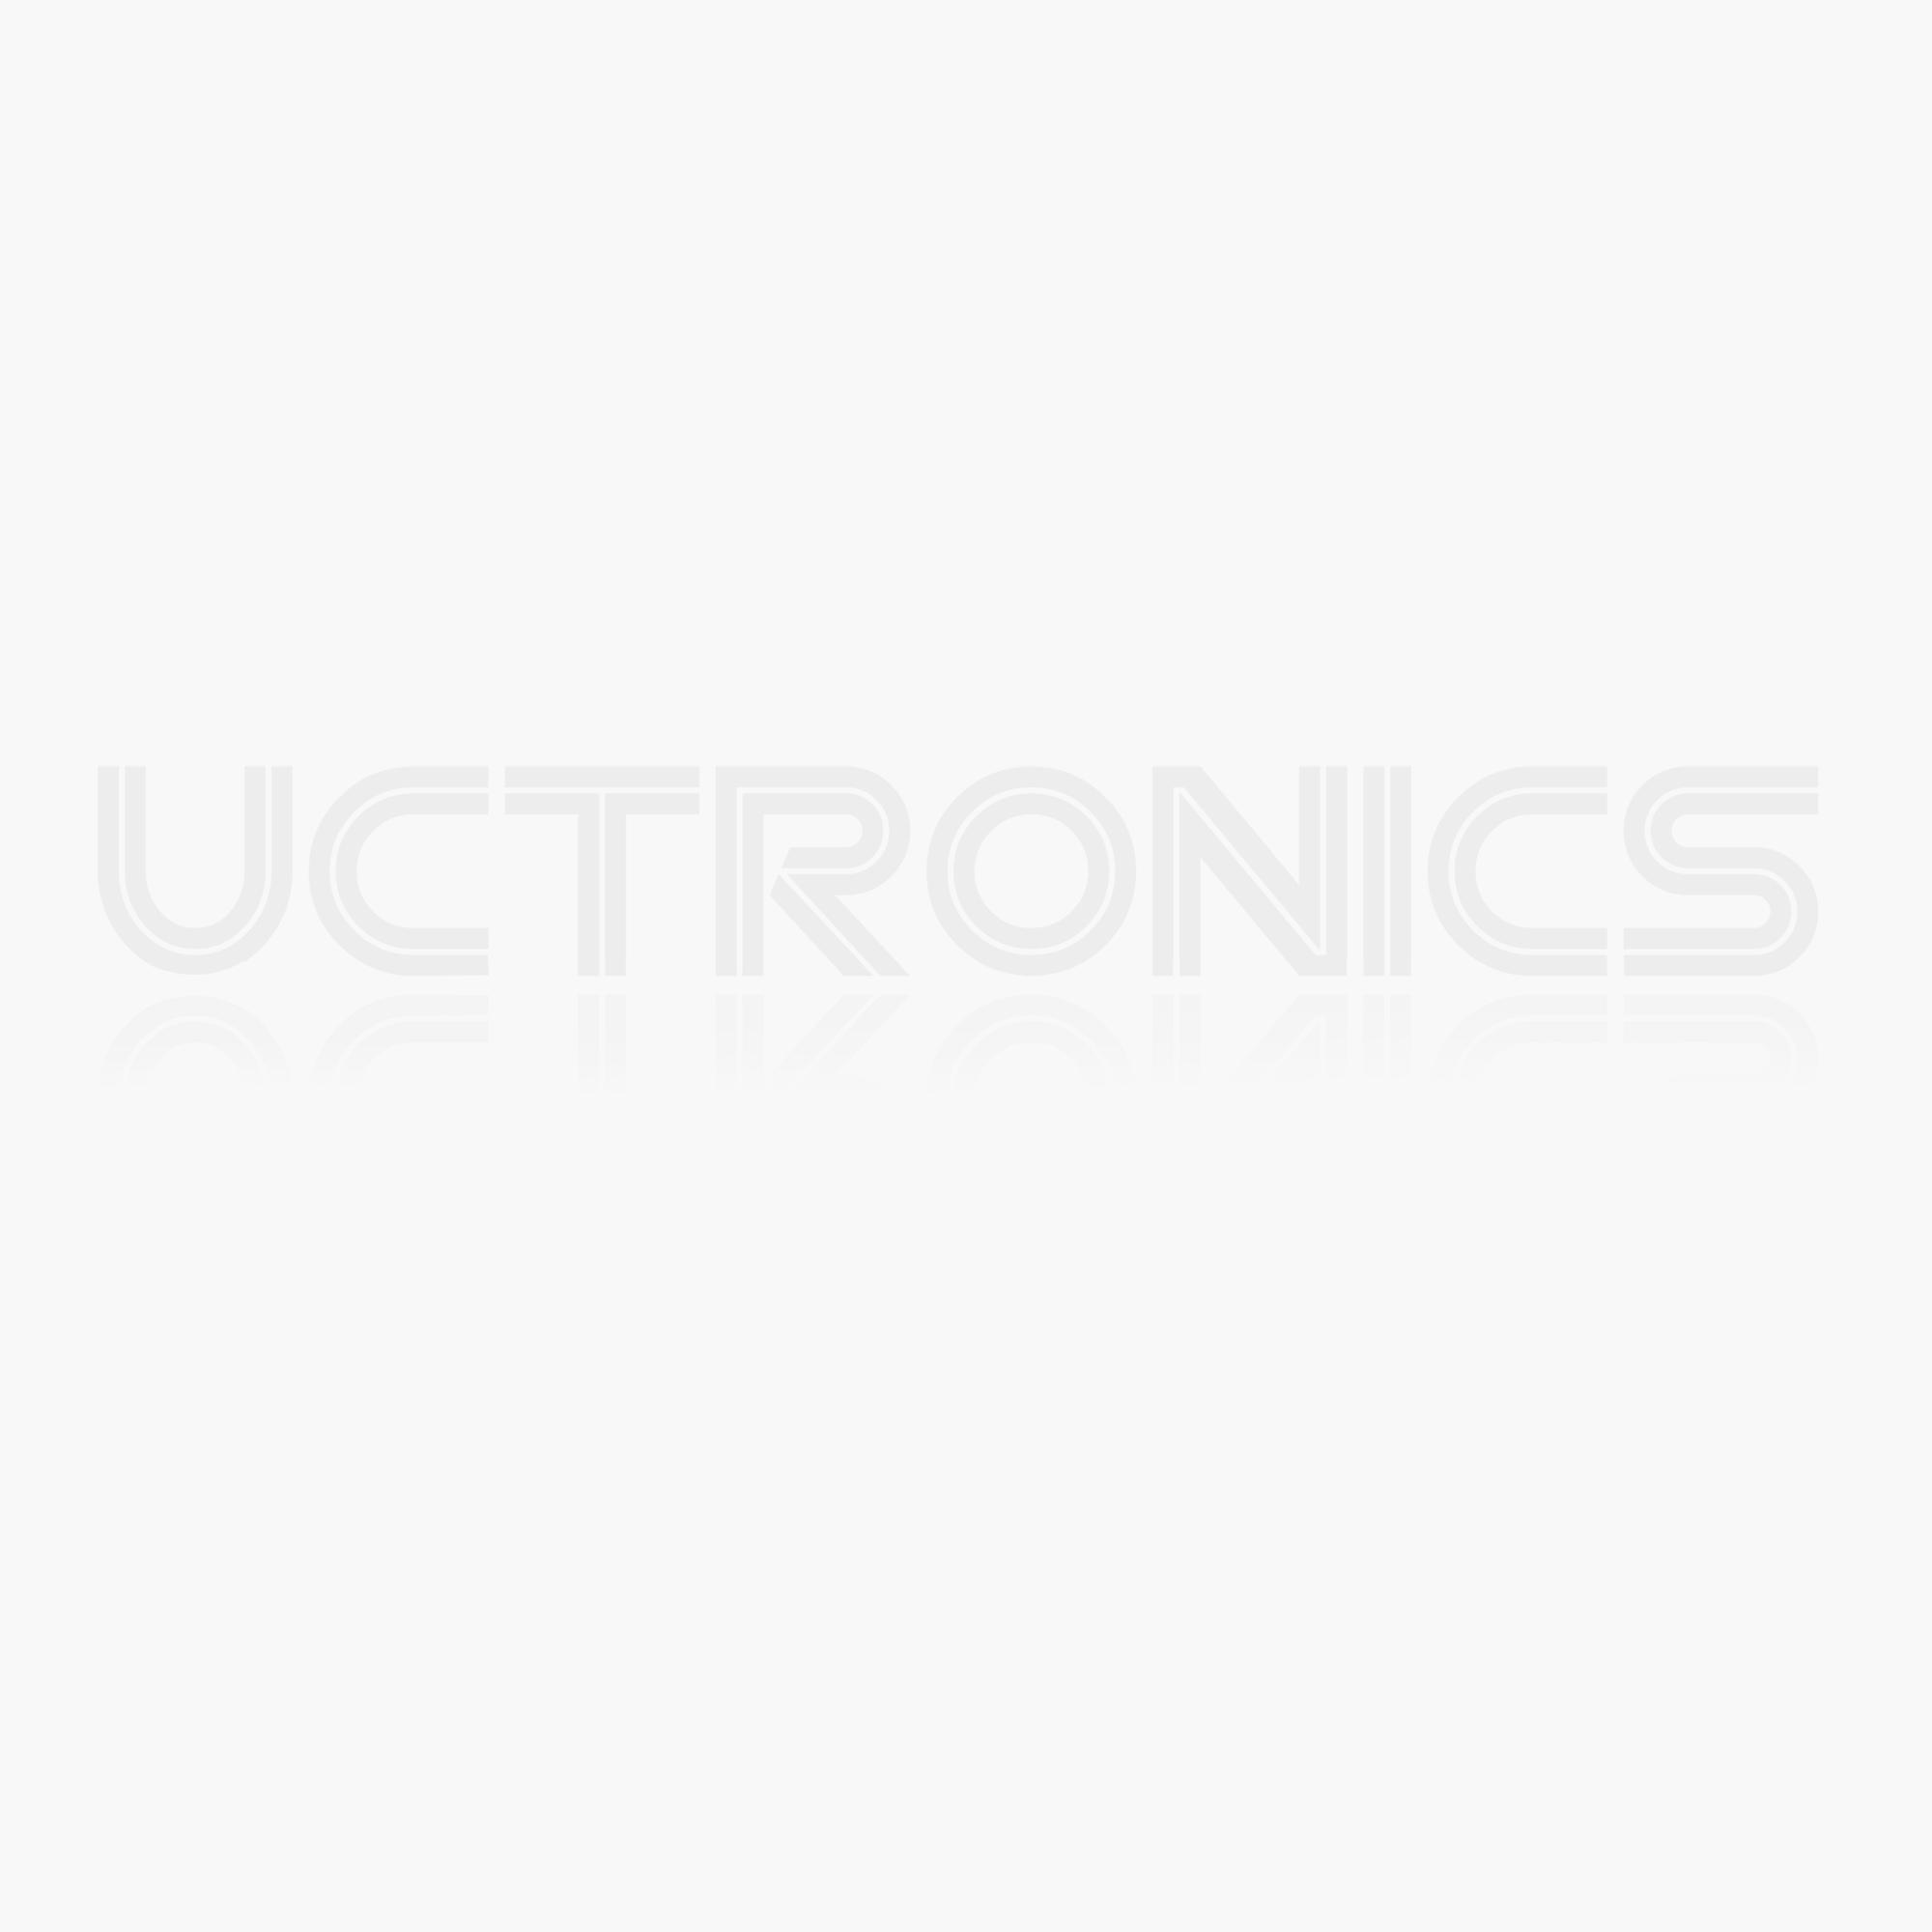 STC89C58RD+40C-PDIPSTC STC89C58RD 89C58 DIP 40pin STC IC Chip